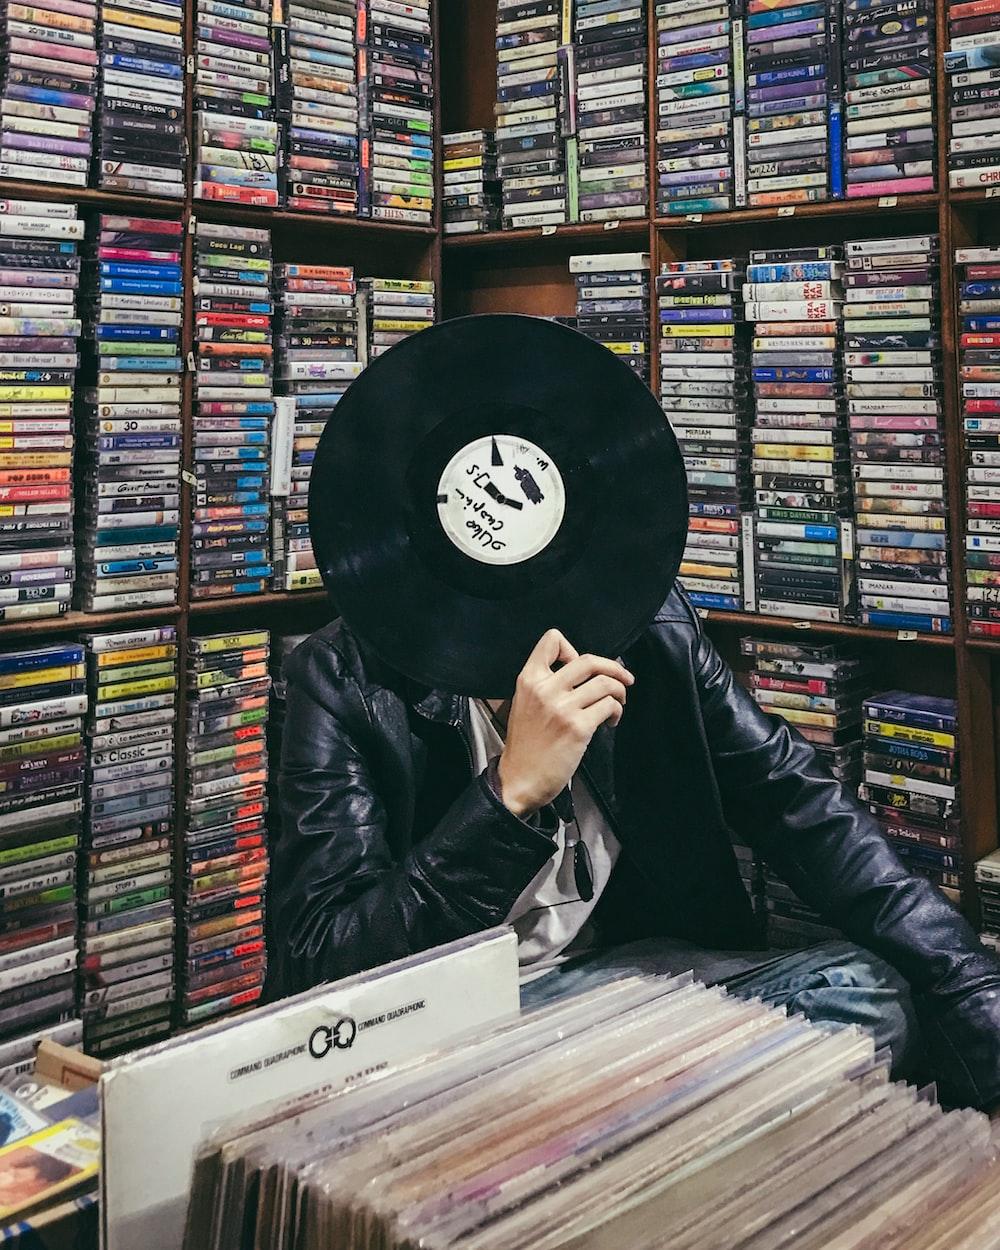 person holding black vinyl disc